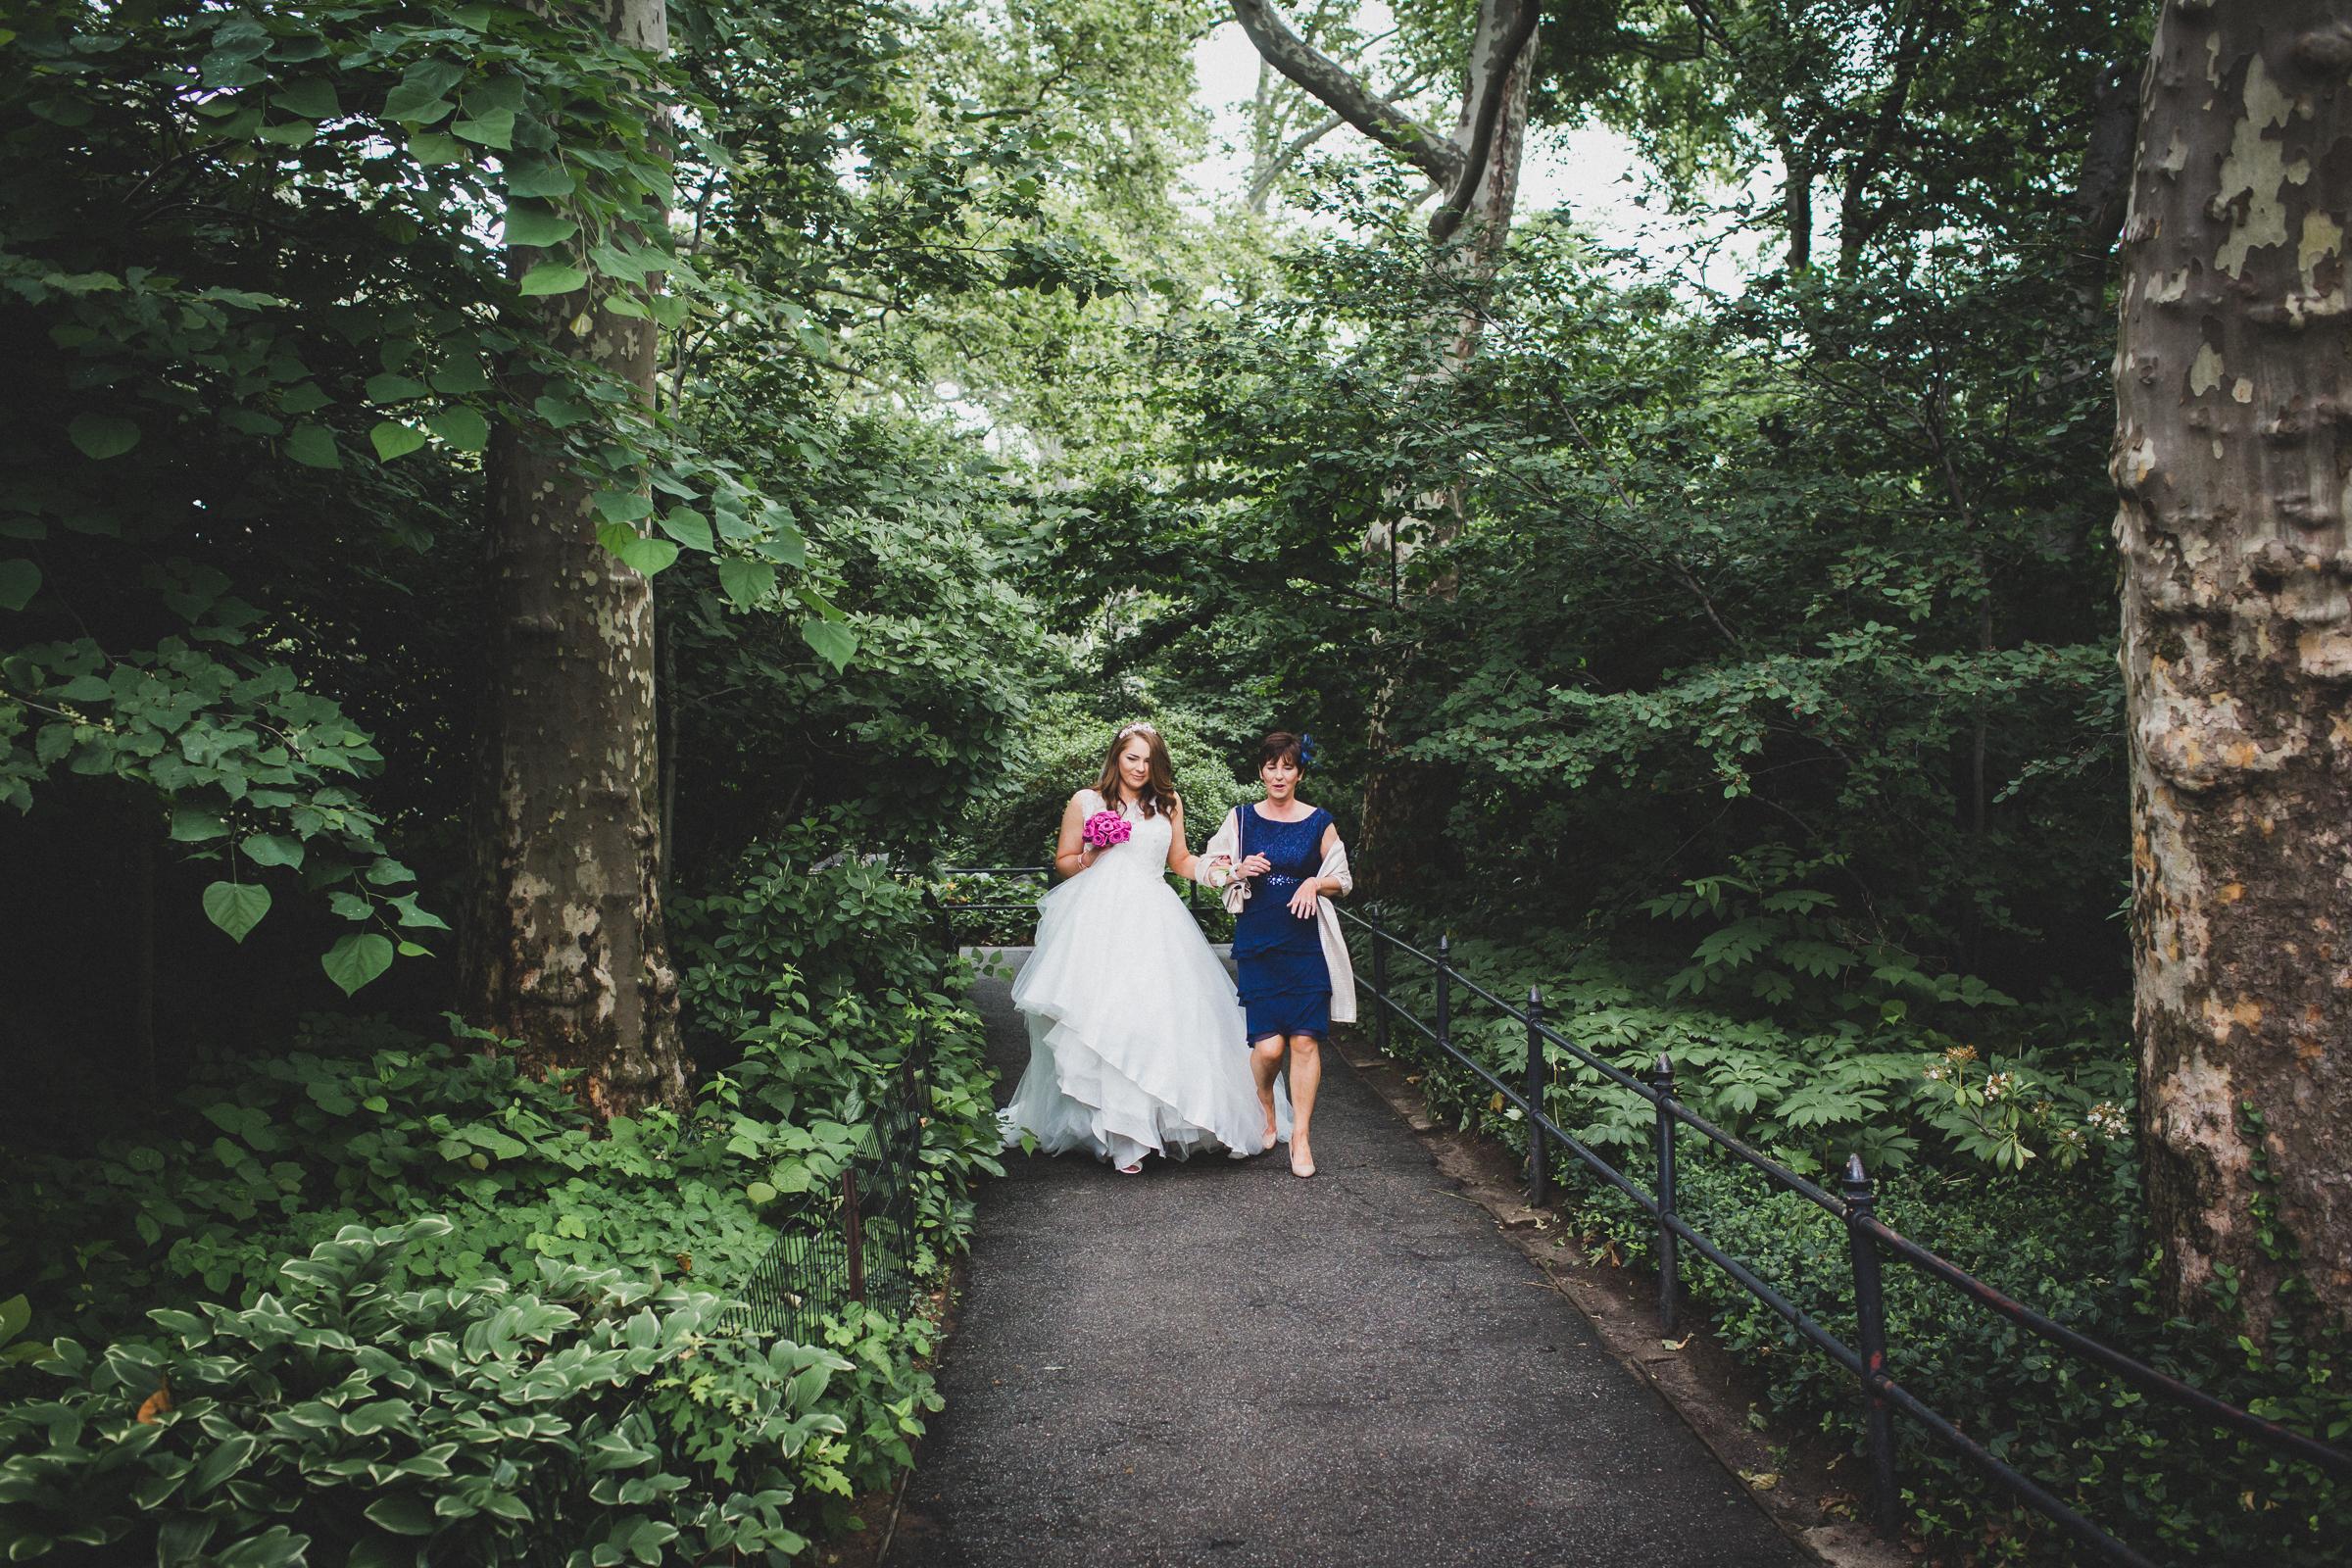 NYC-Central-Park-Elopement-New-York-Documentary-Wedding-Photographer-Dumbo-Brooklyn-Bridge-Park--11.jpg